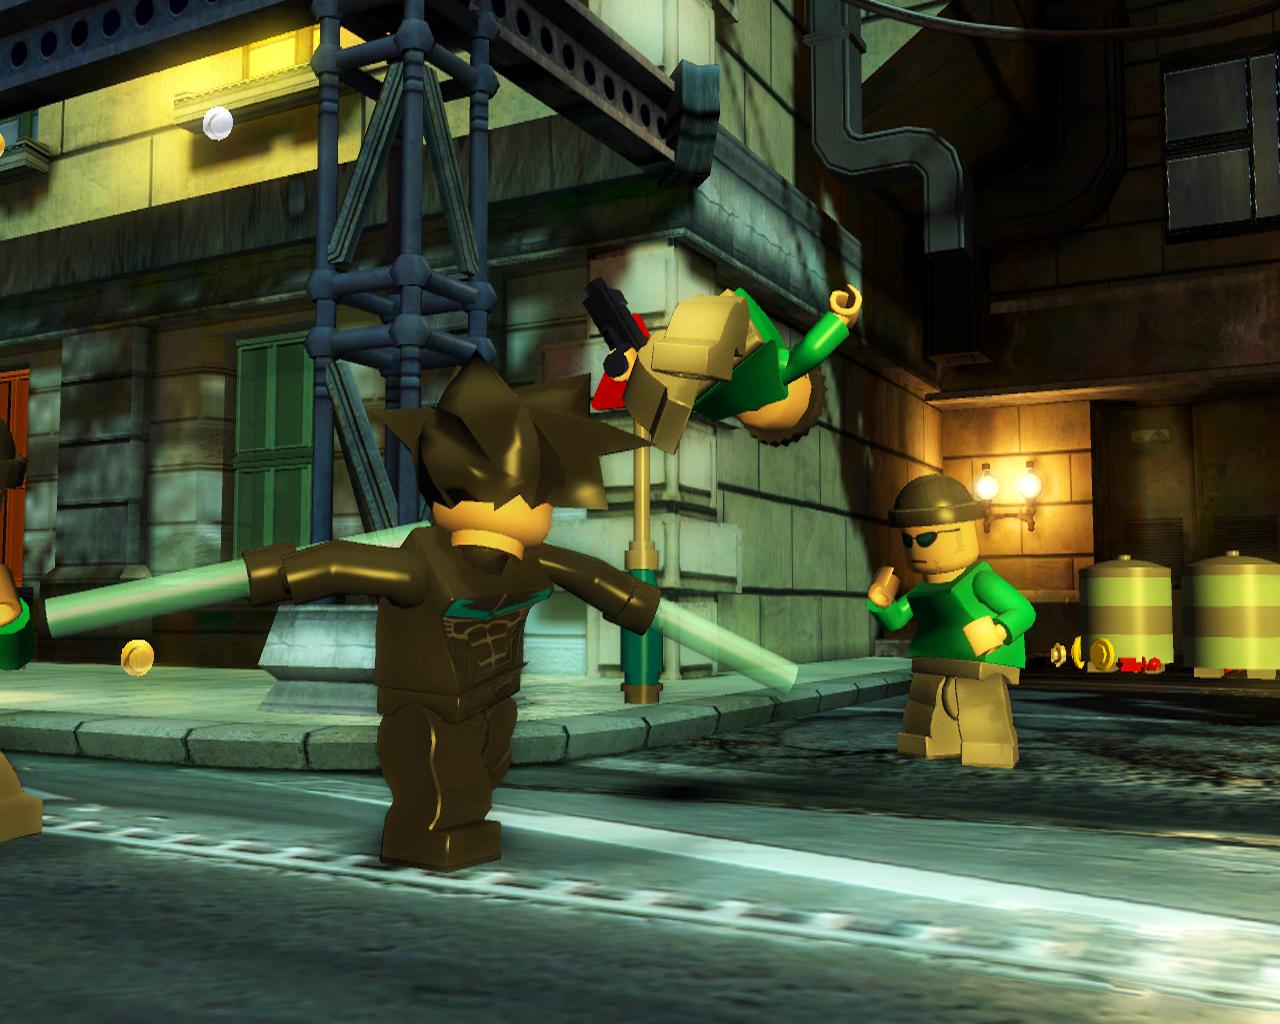 3 New LEGO Batman Characters Announced   XboxAchievements.com